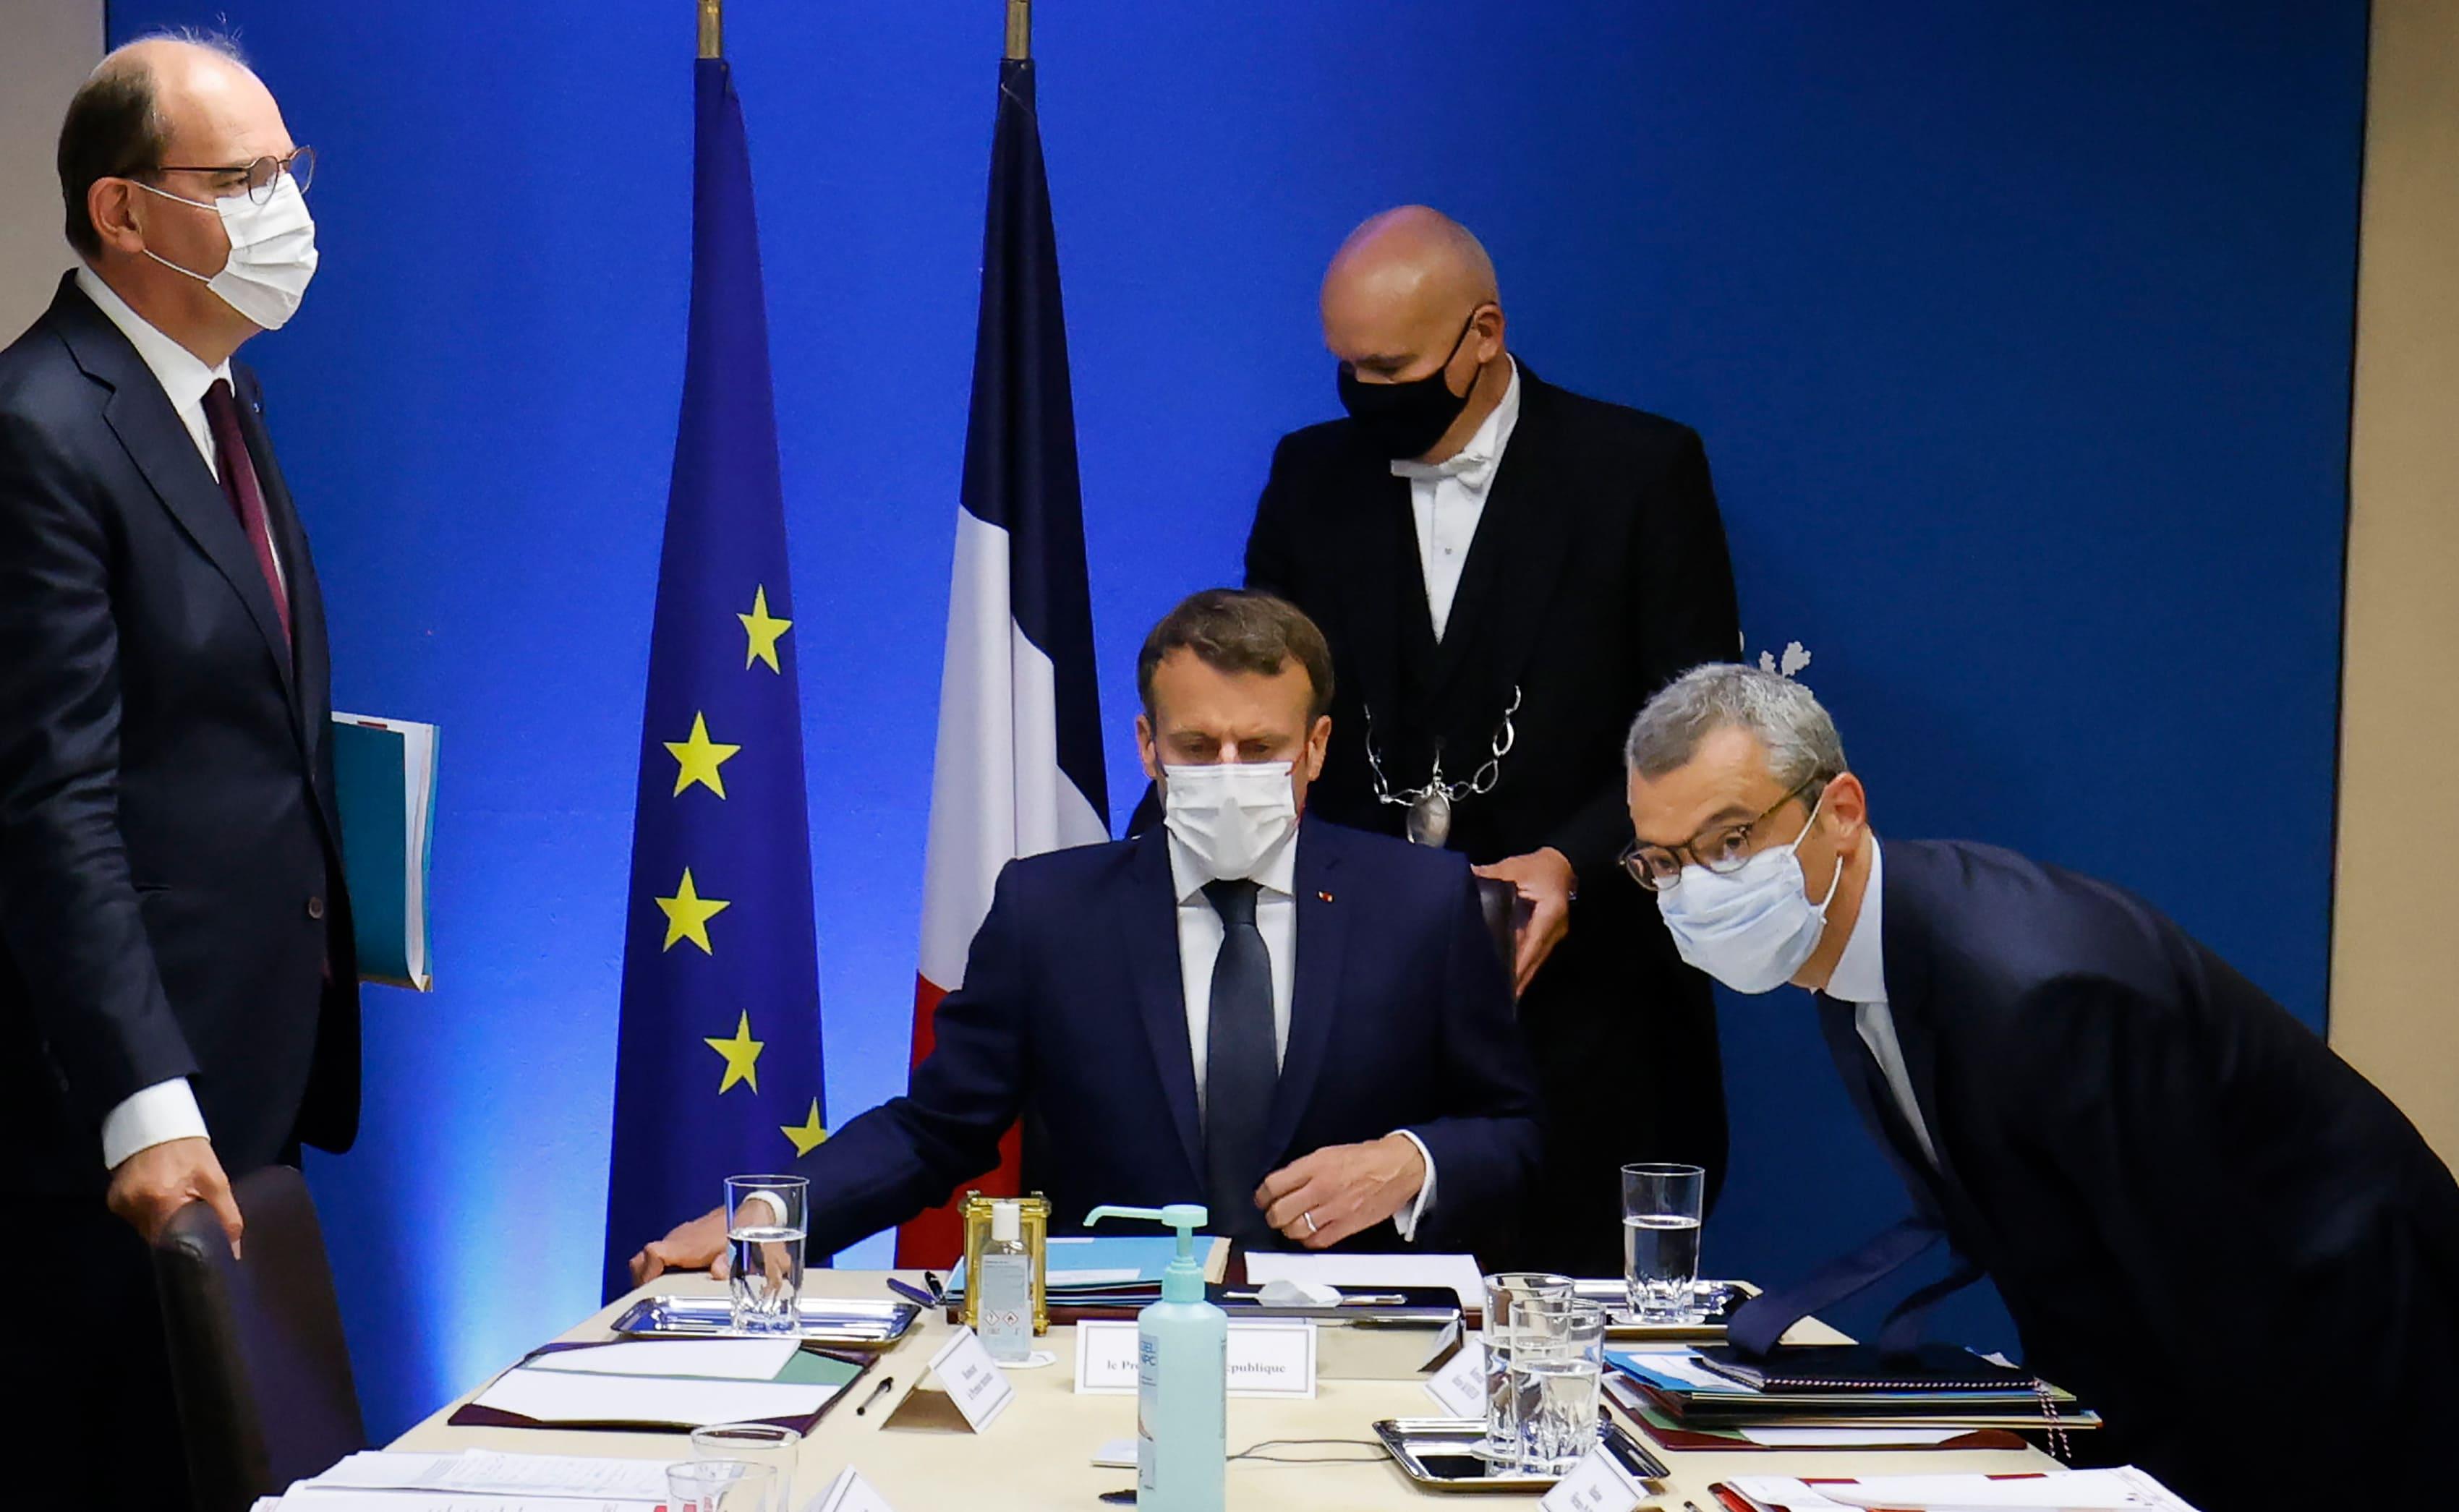 Президент Франции Макрон на совещании по вопросам нацбезопасности, где обсуждали Pegasus, 22 июля (фото – EPA)